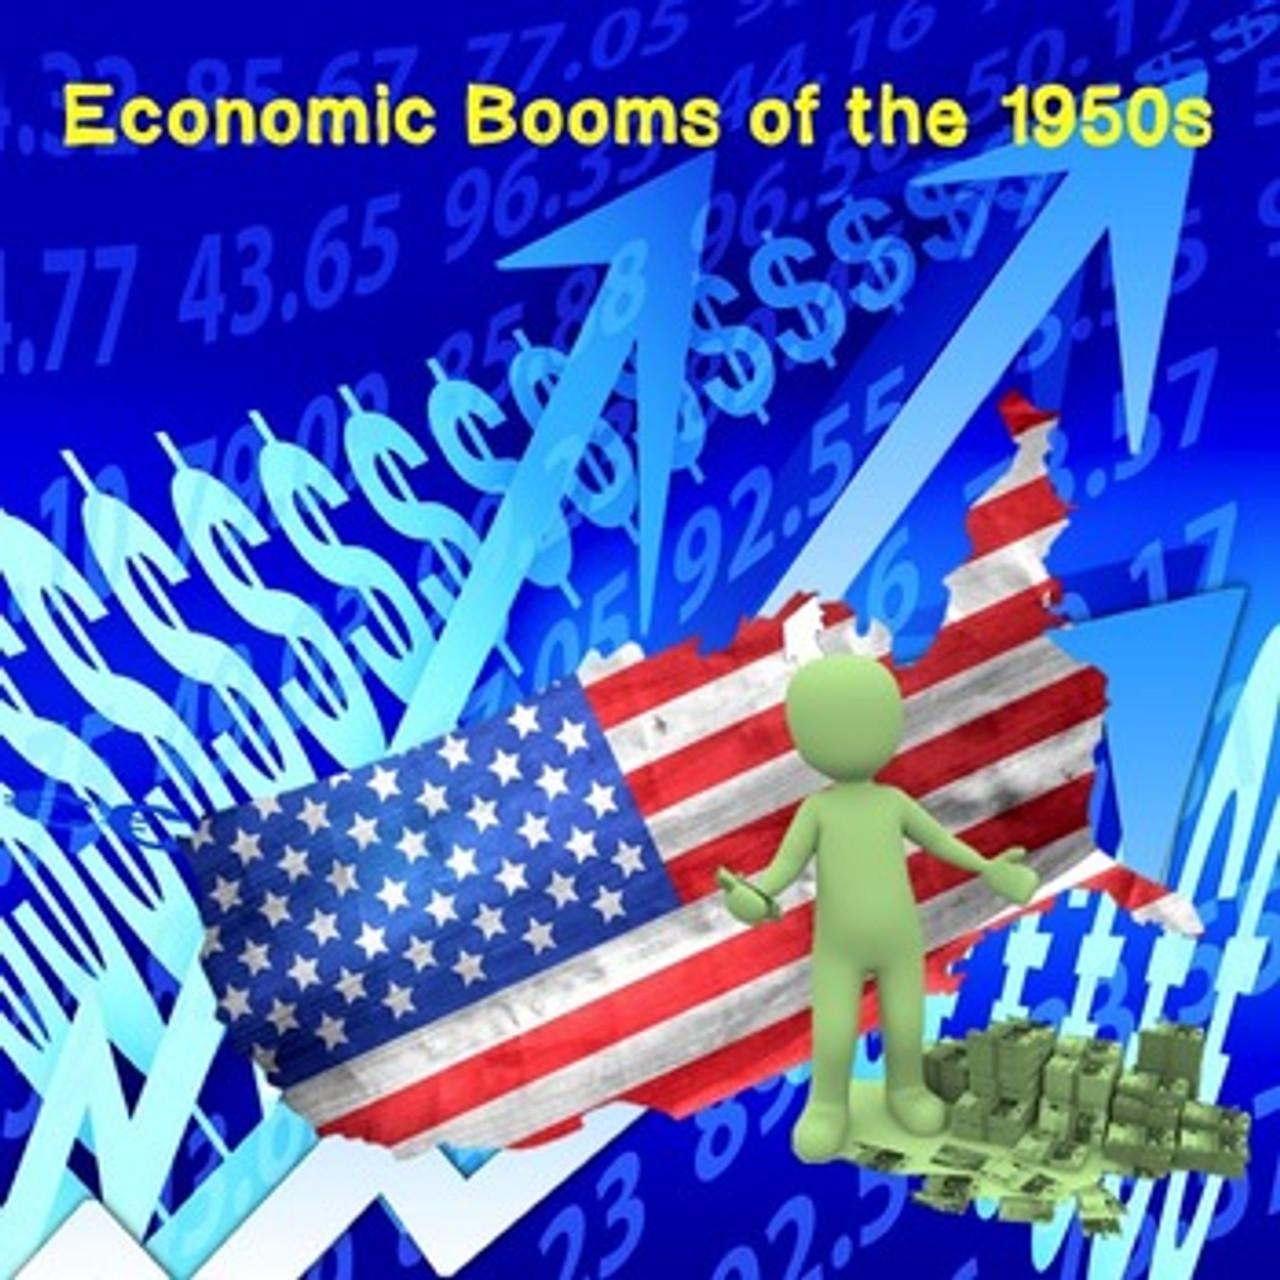 Economic Booms of the 1950s Webquest